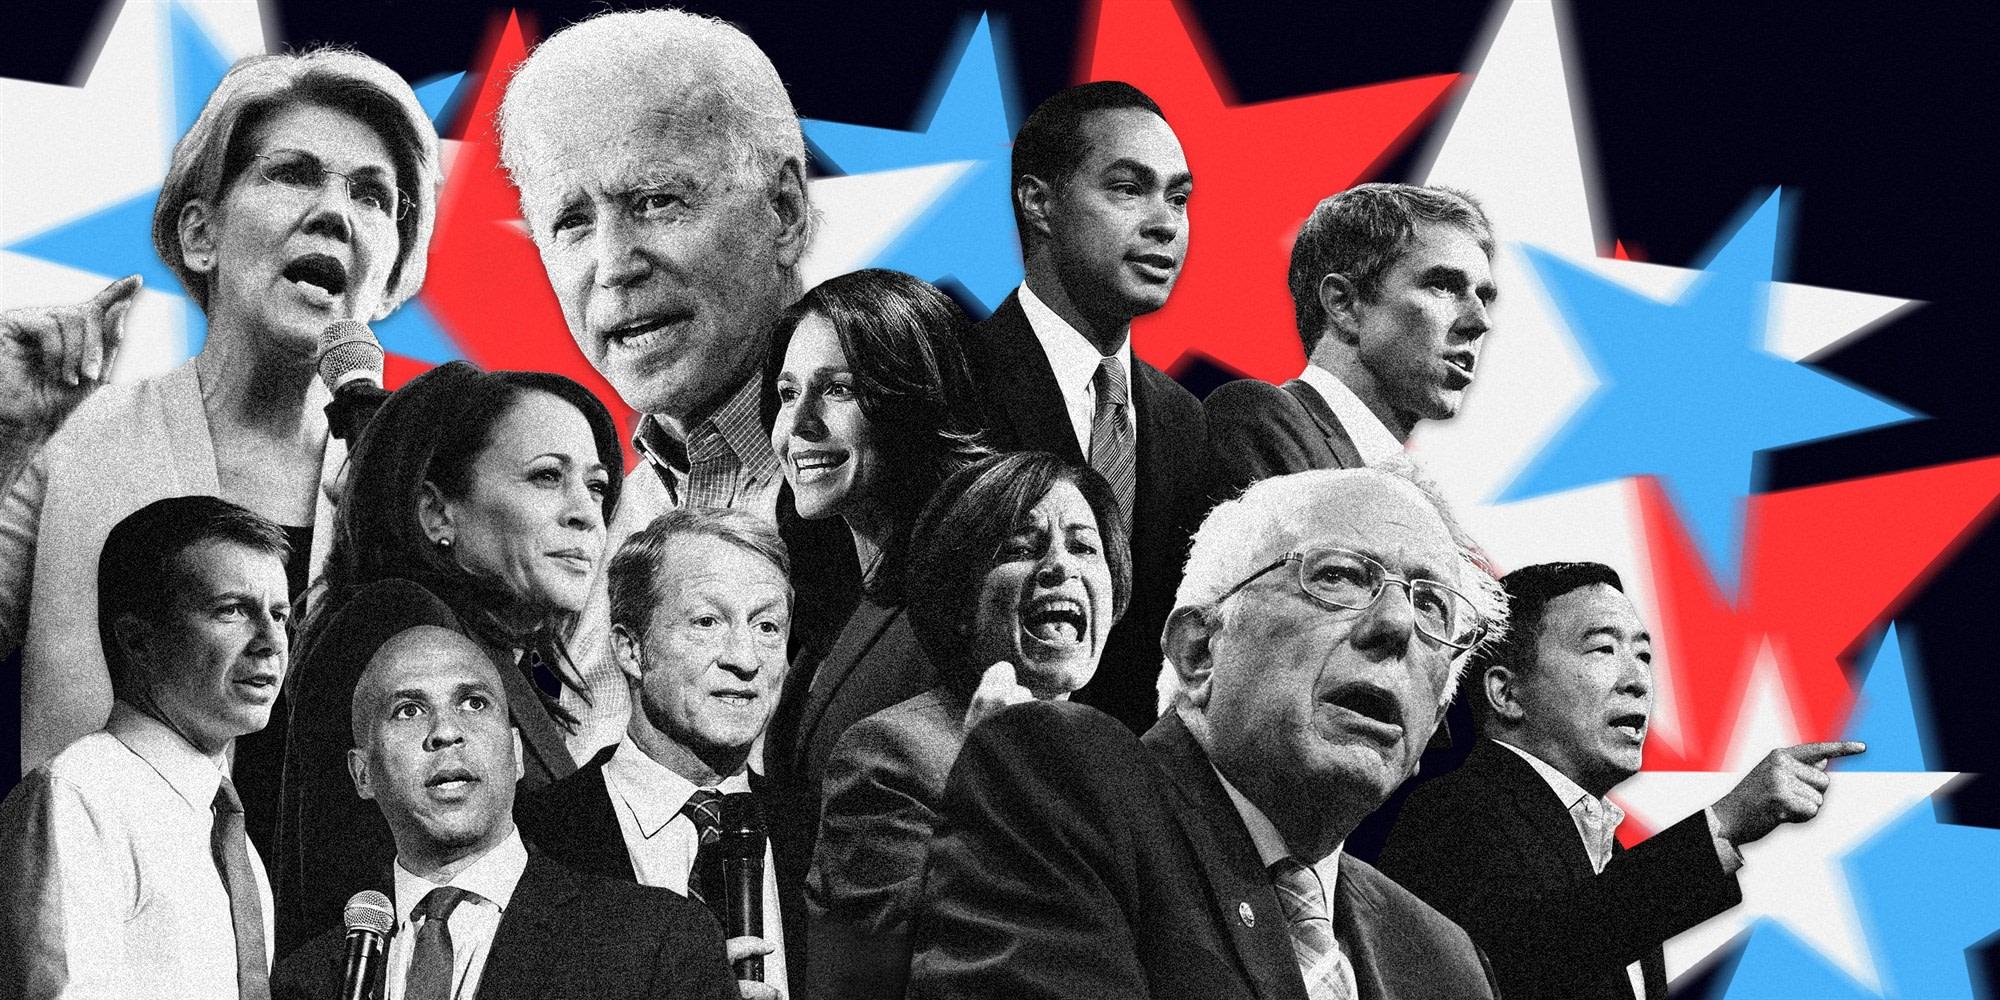 Twelve 2020 democratic presidential candidates